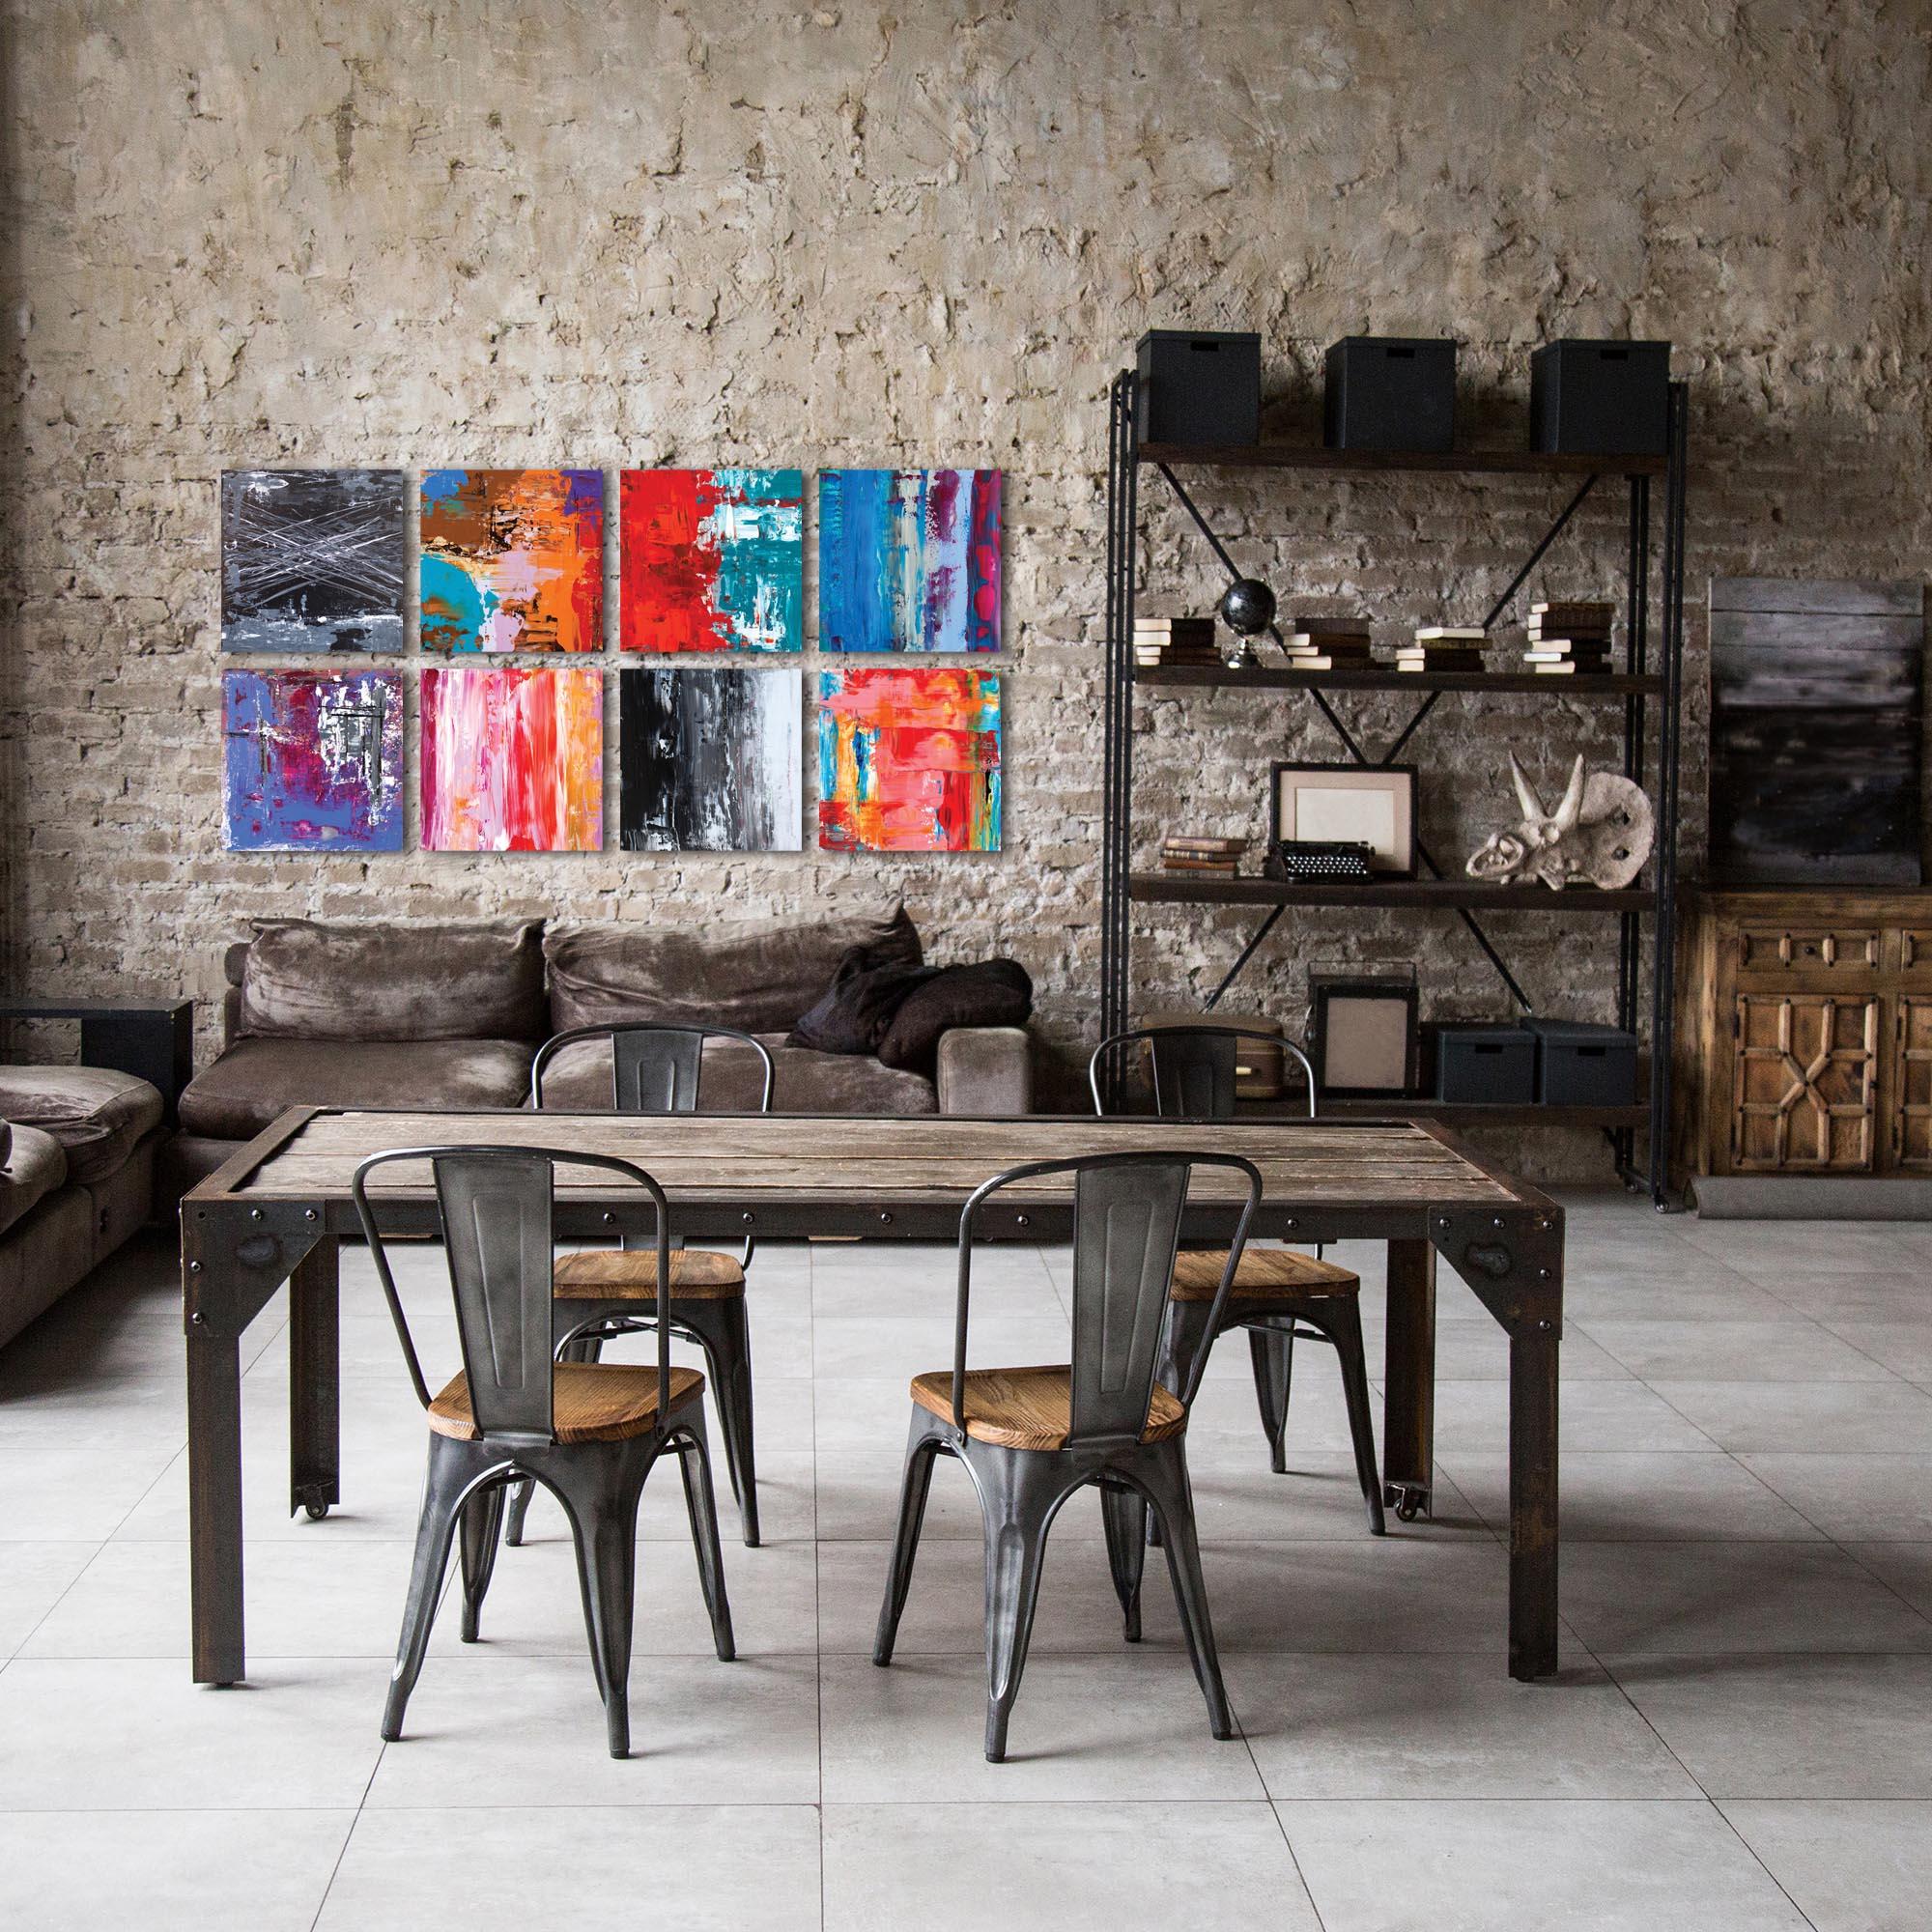 Urban Windows Large By Celeste Reiter Abstract Wall Art On Metal Or Plexigl